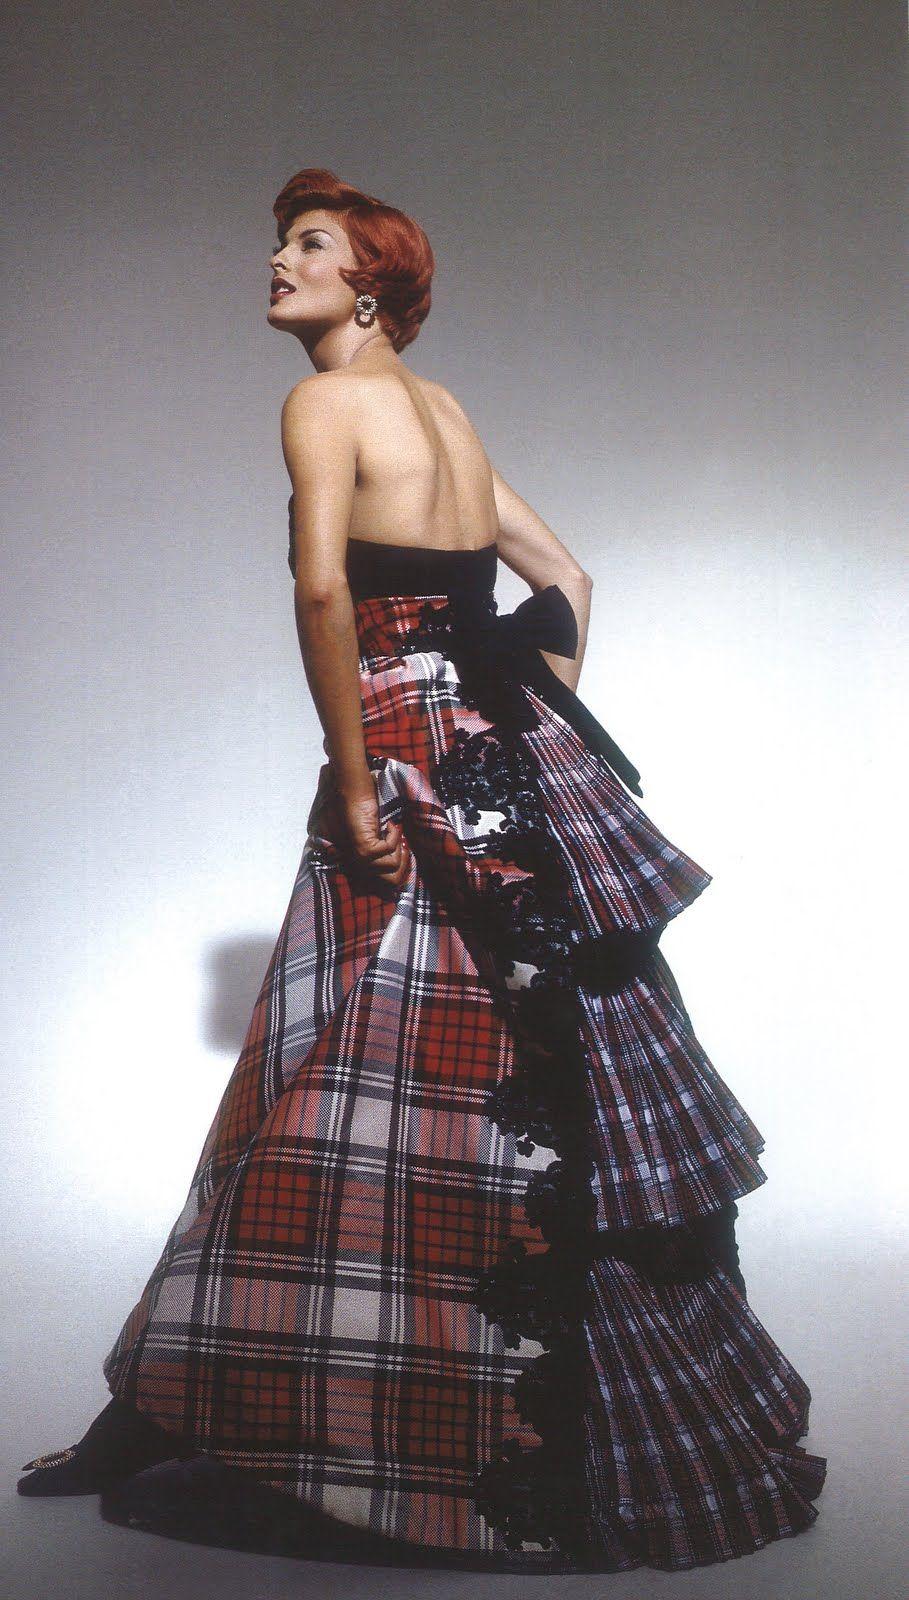 Scottish tartan wedding dress  DIY Home Projects  Pinning The Needlepoints  Pinterest  Linda